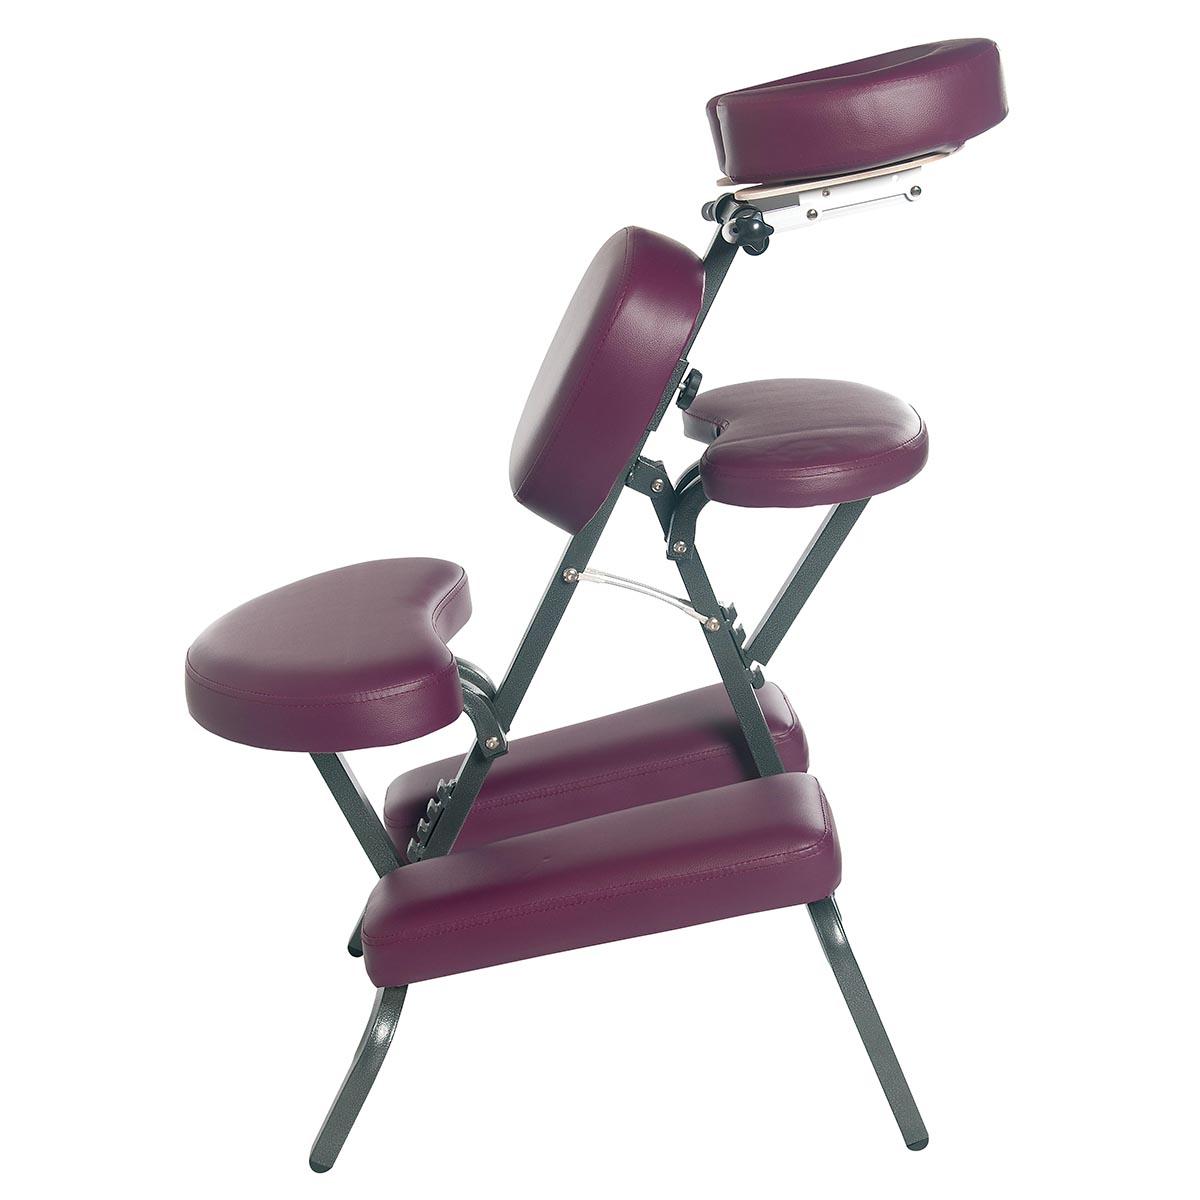 Pro massage chair massage furniture portable massage chair for Chair massage